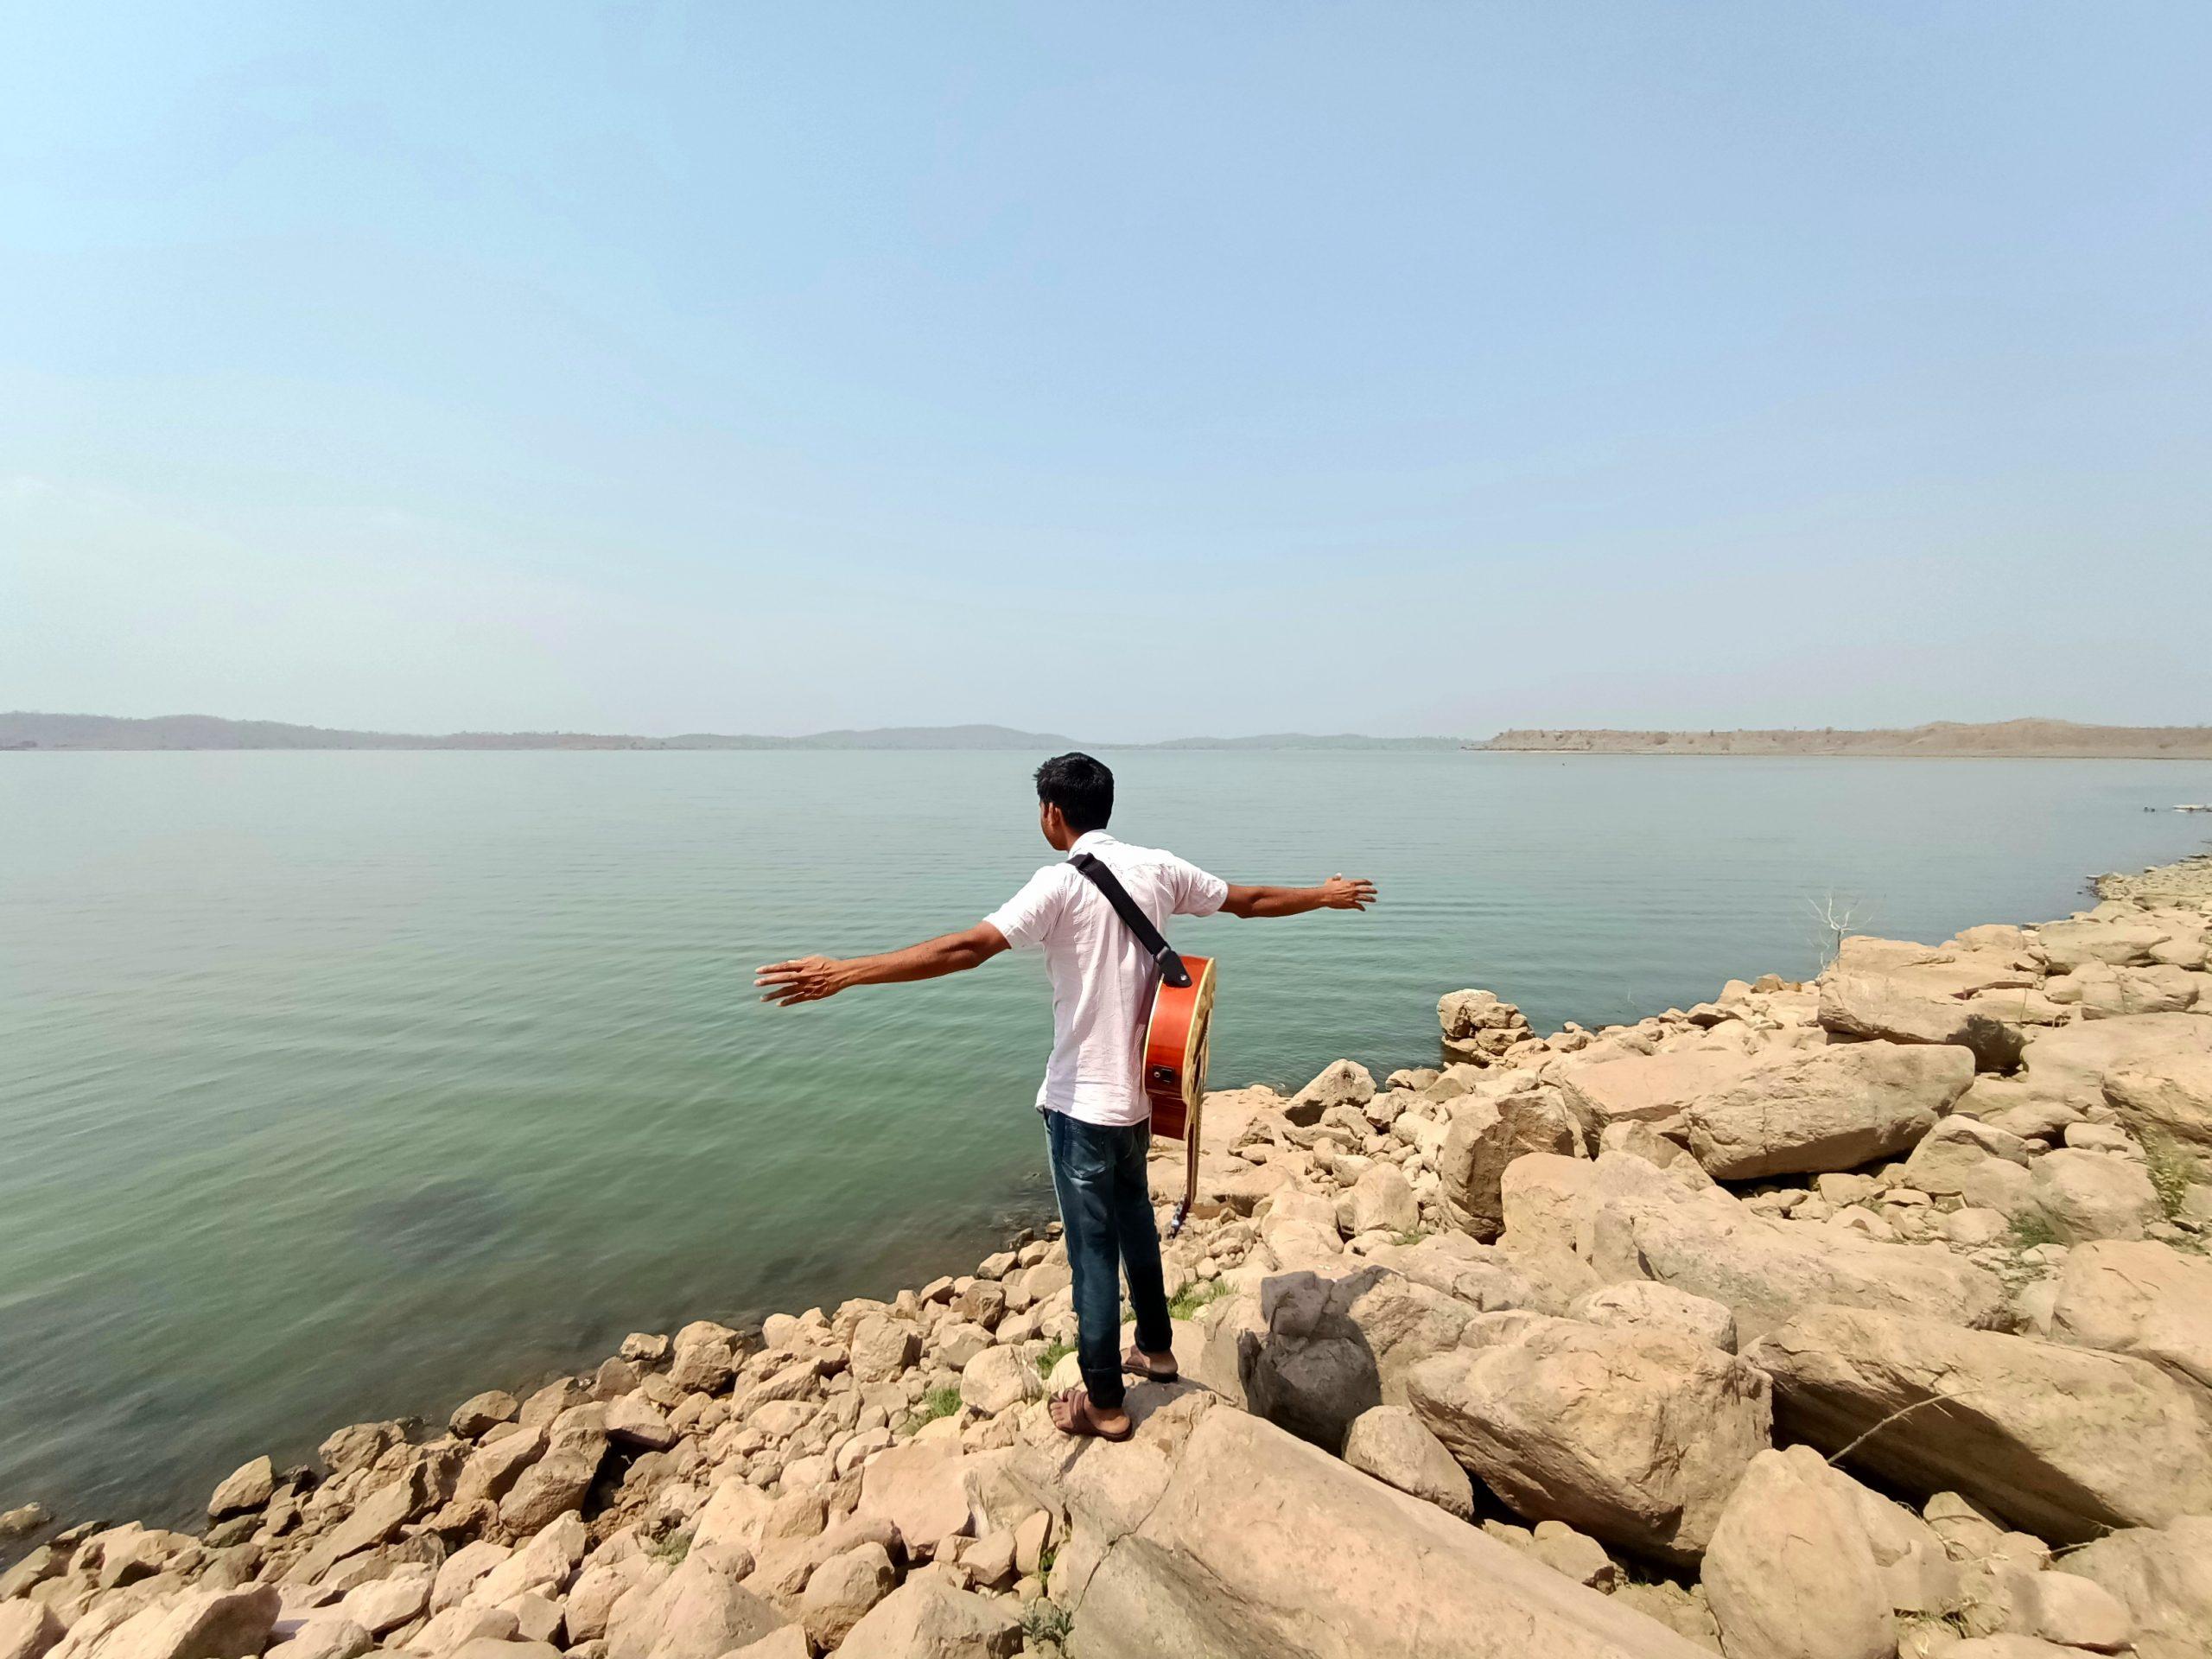 A boy at a river bank